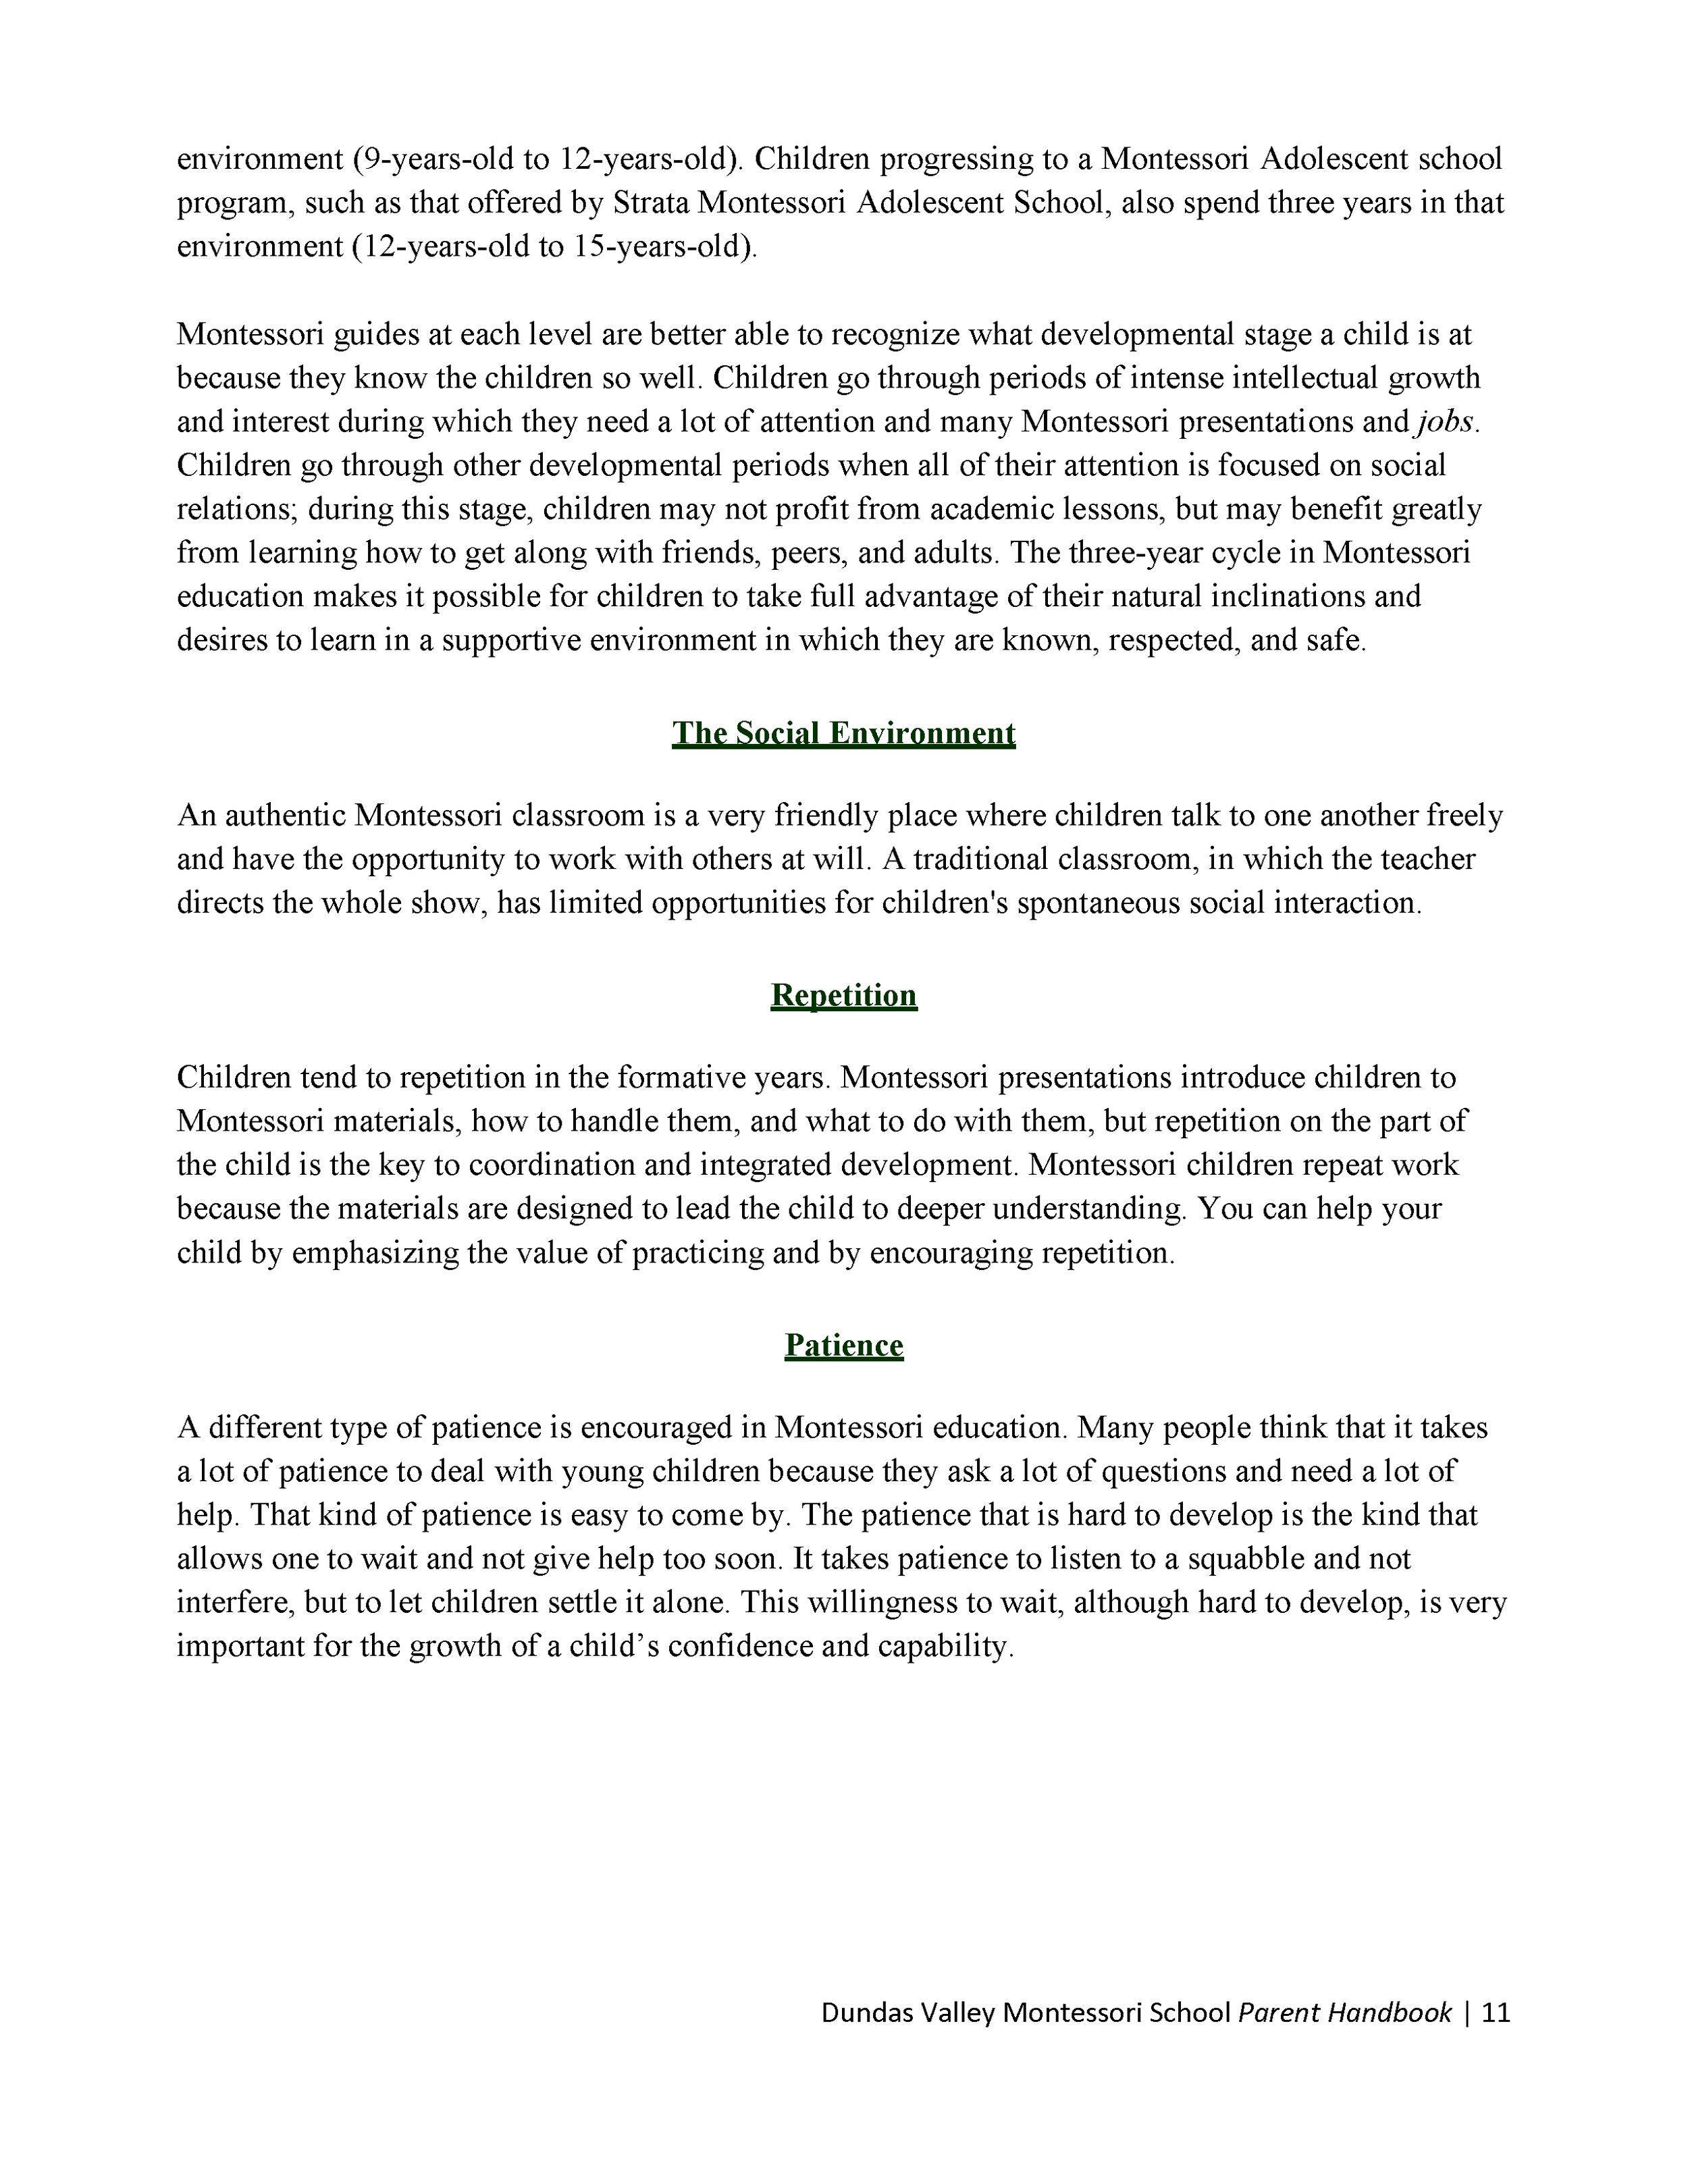 DVMS-Parent-Handbook-19-20_Page_013.png